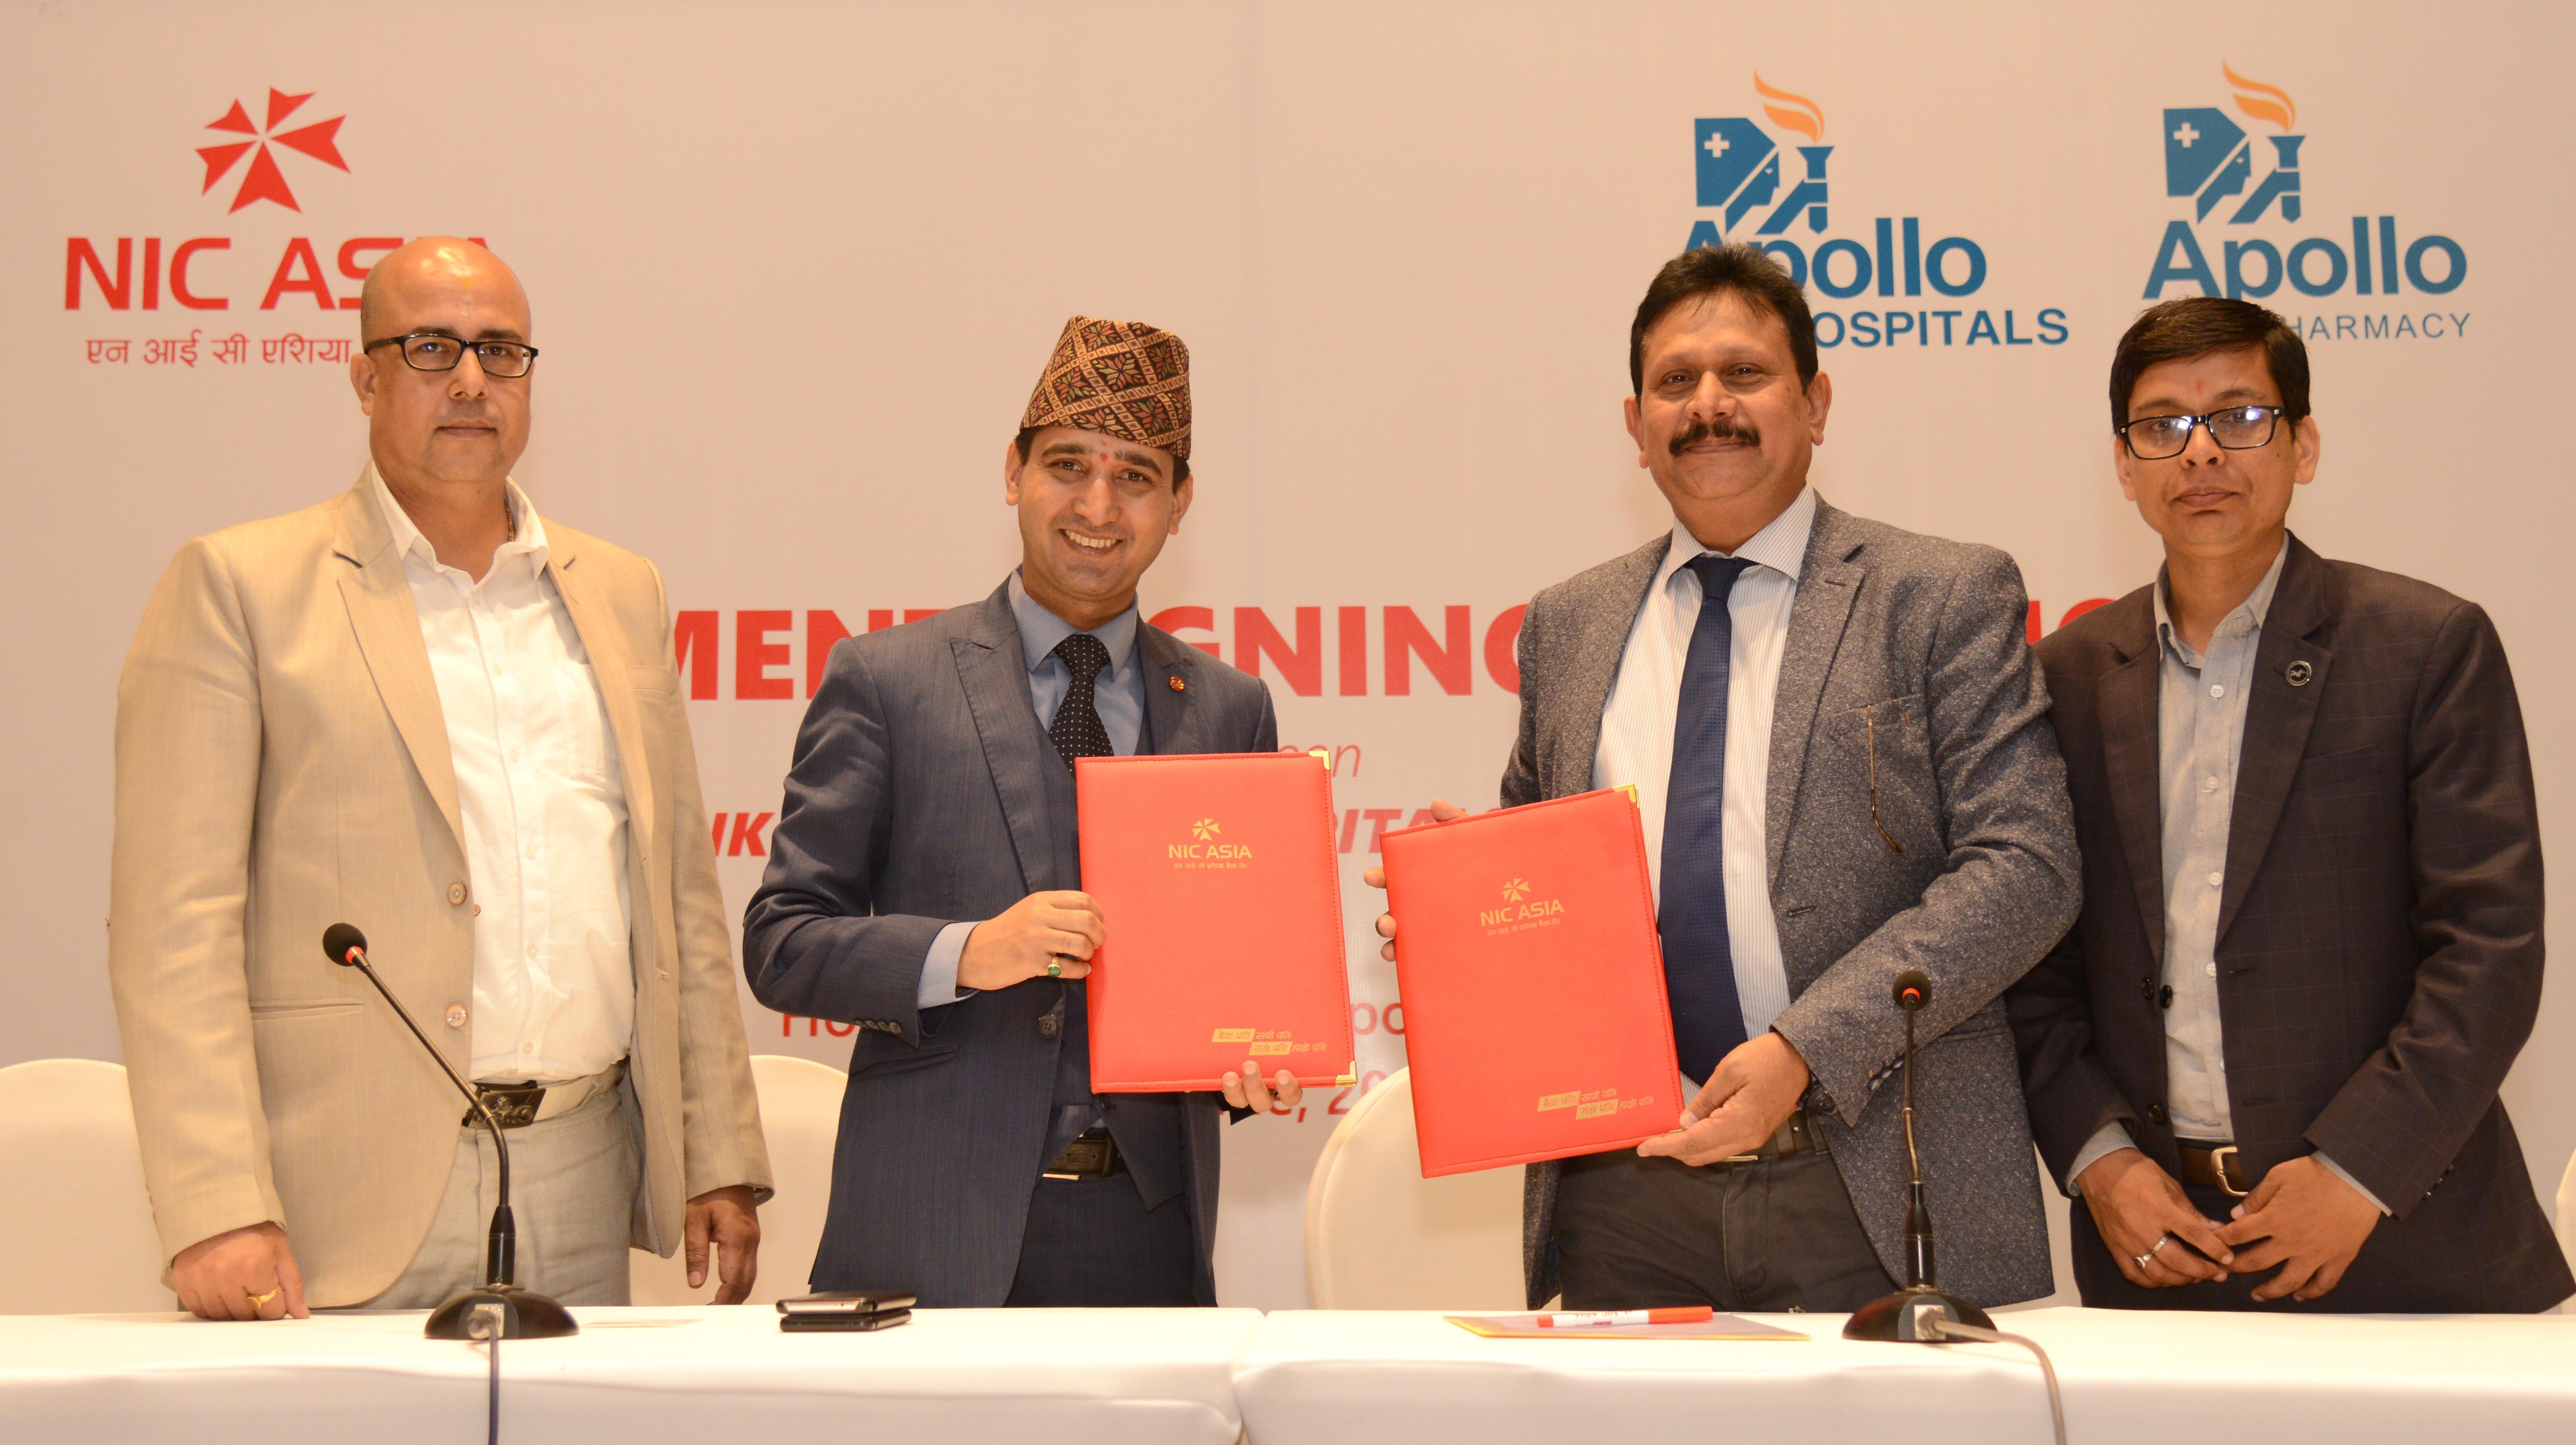 एनआईसी एशिया बैंक र एपोलो हस्पिटलबीच सम्झौता